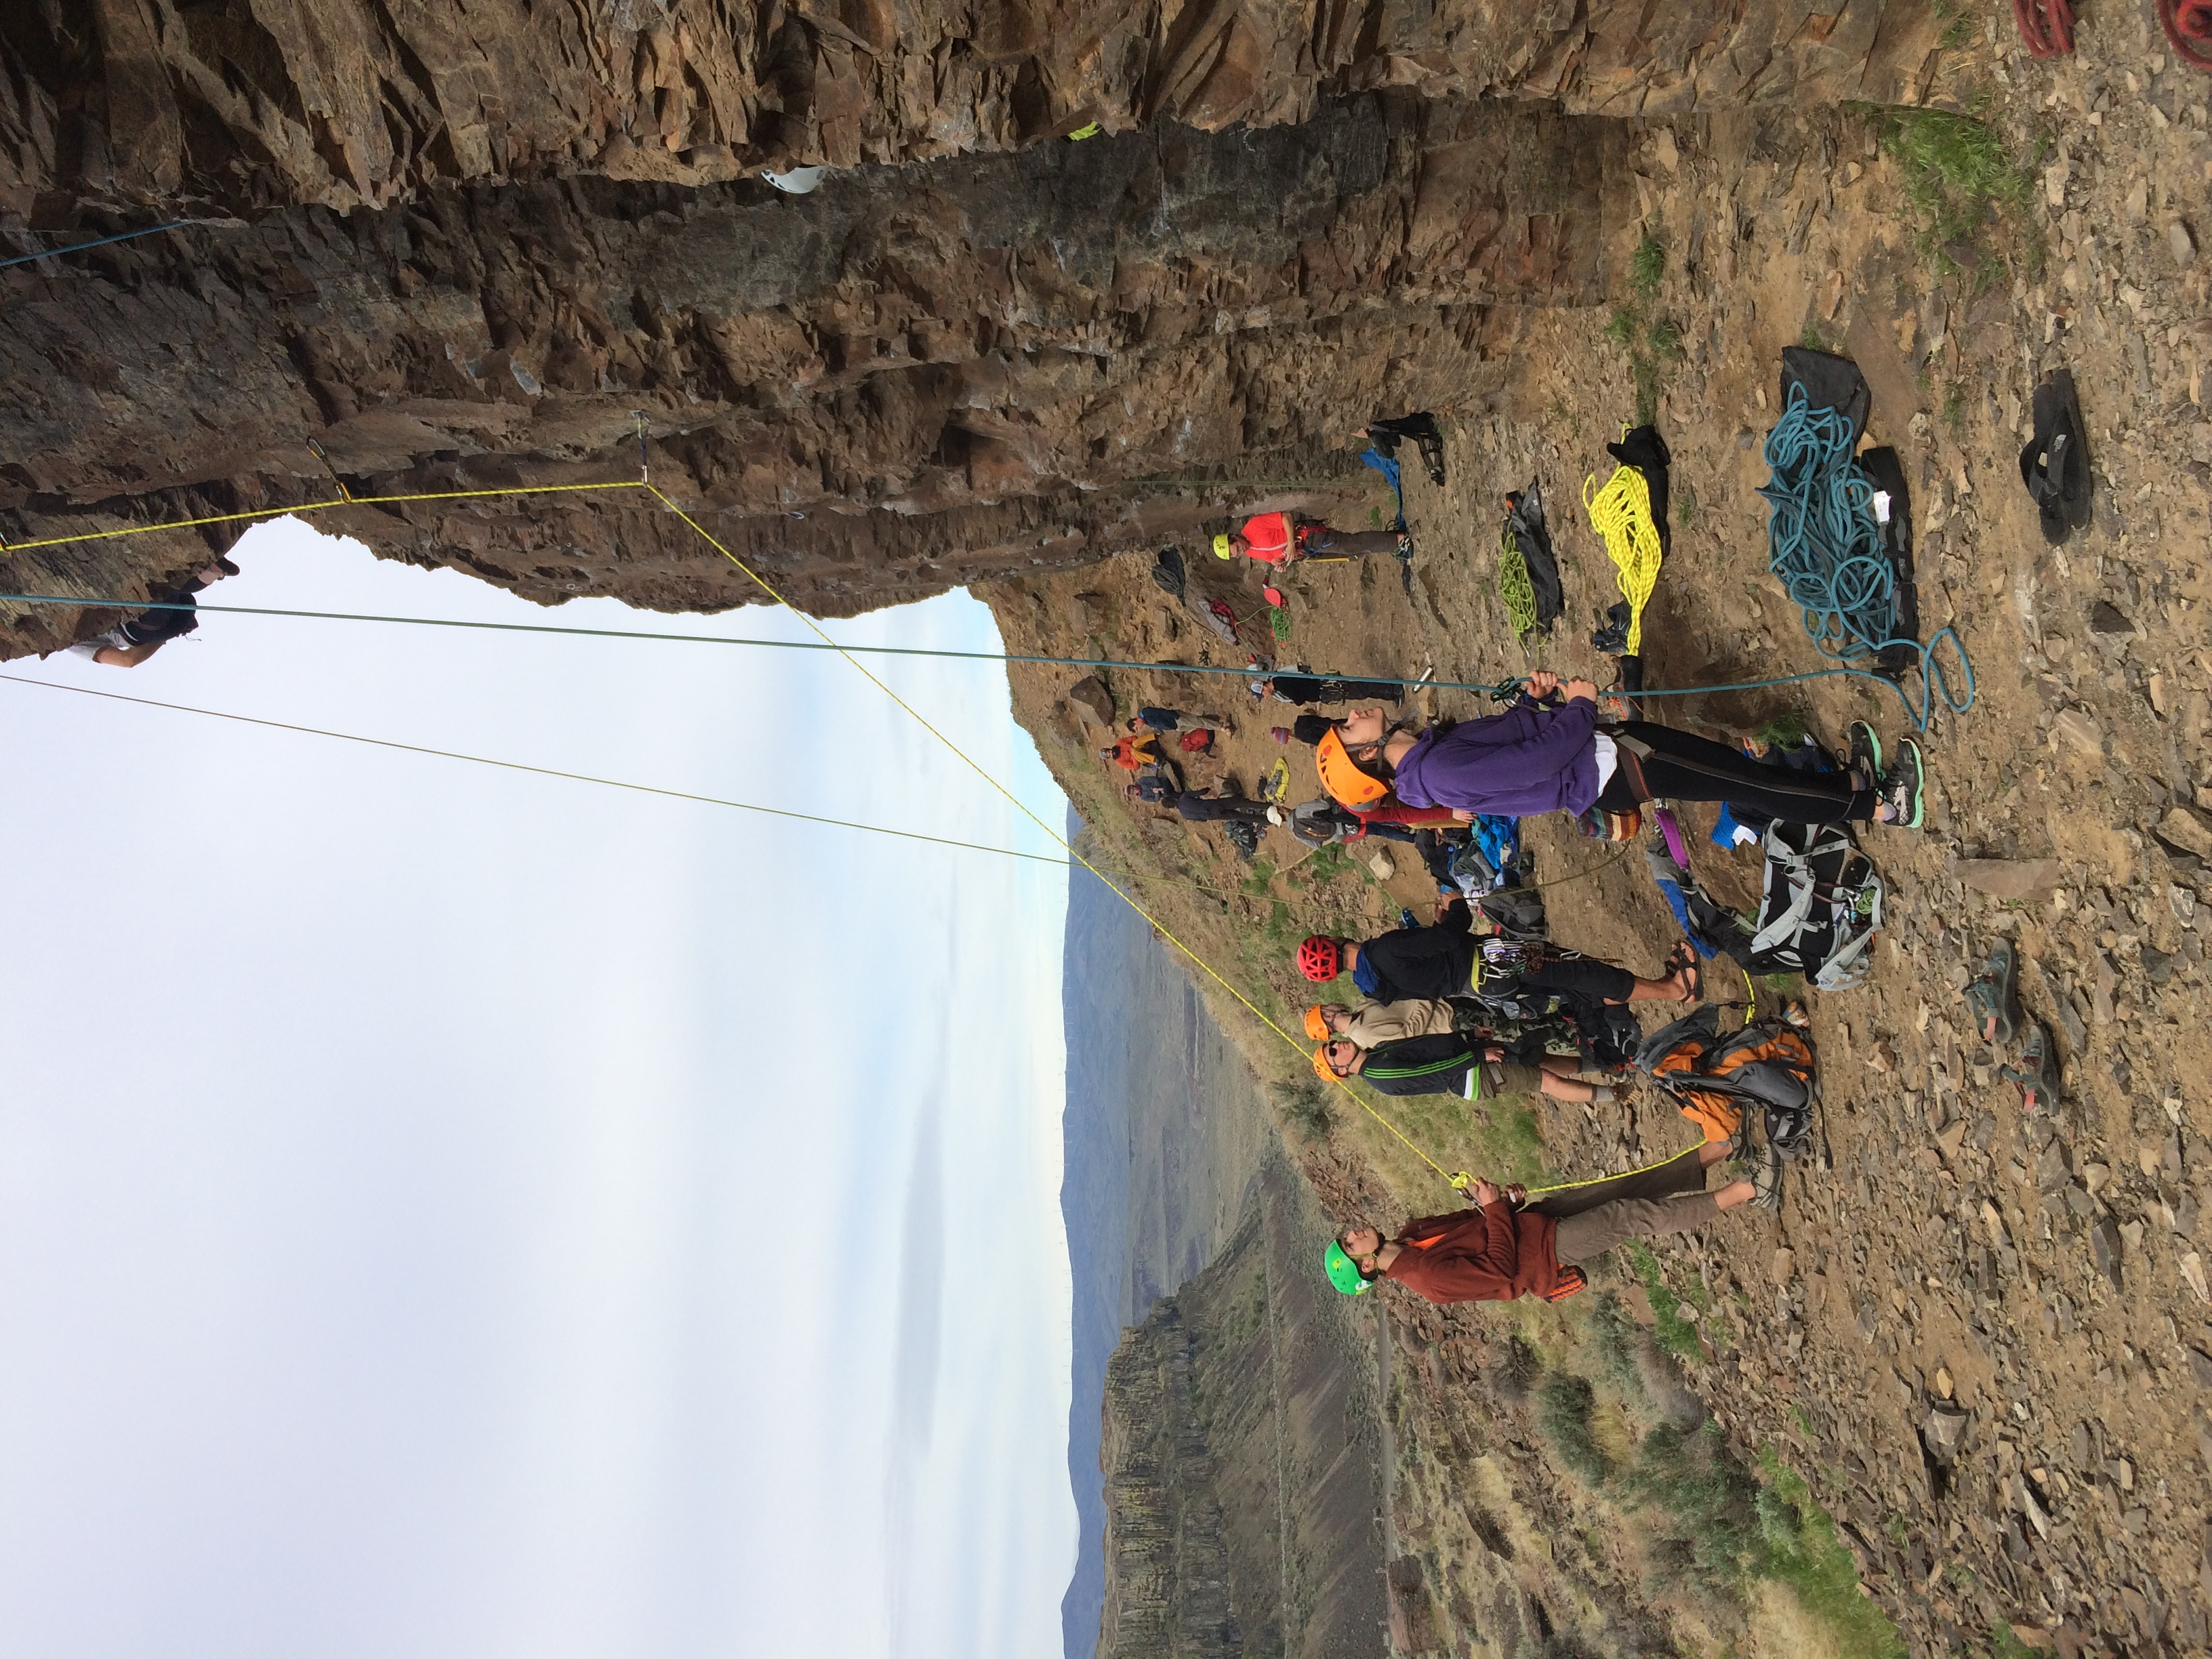 Vantage climbing